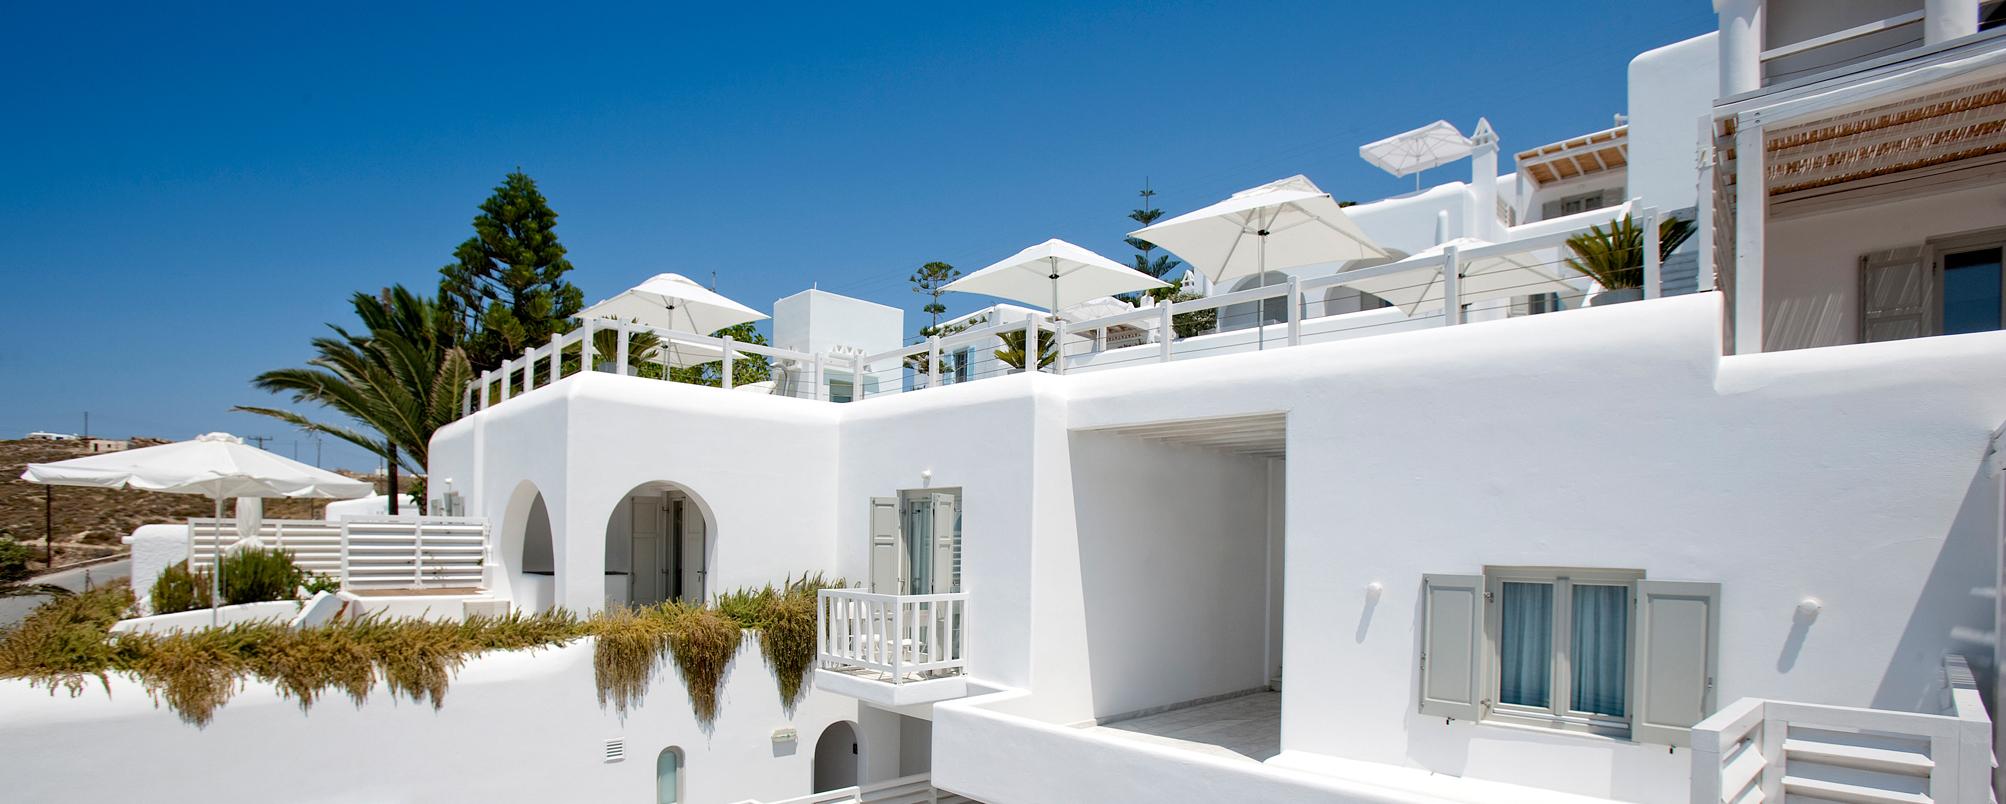 grace-mykonos-exterior